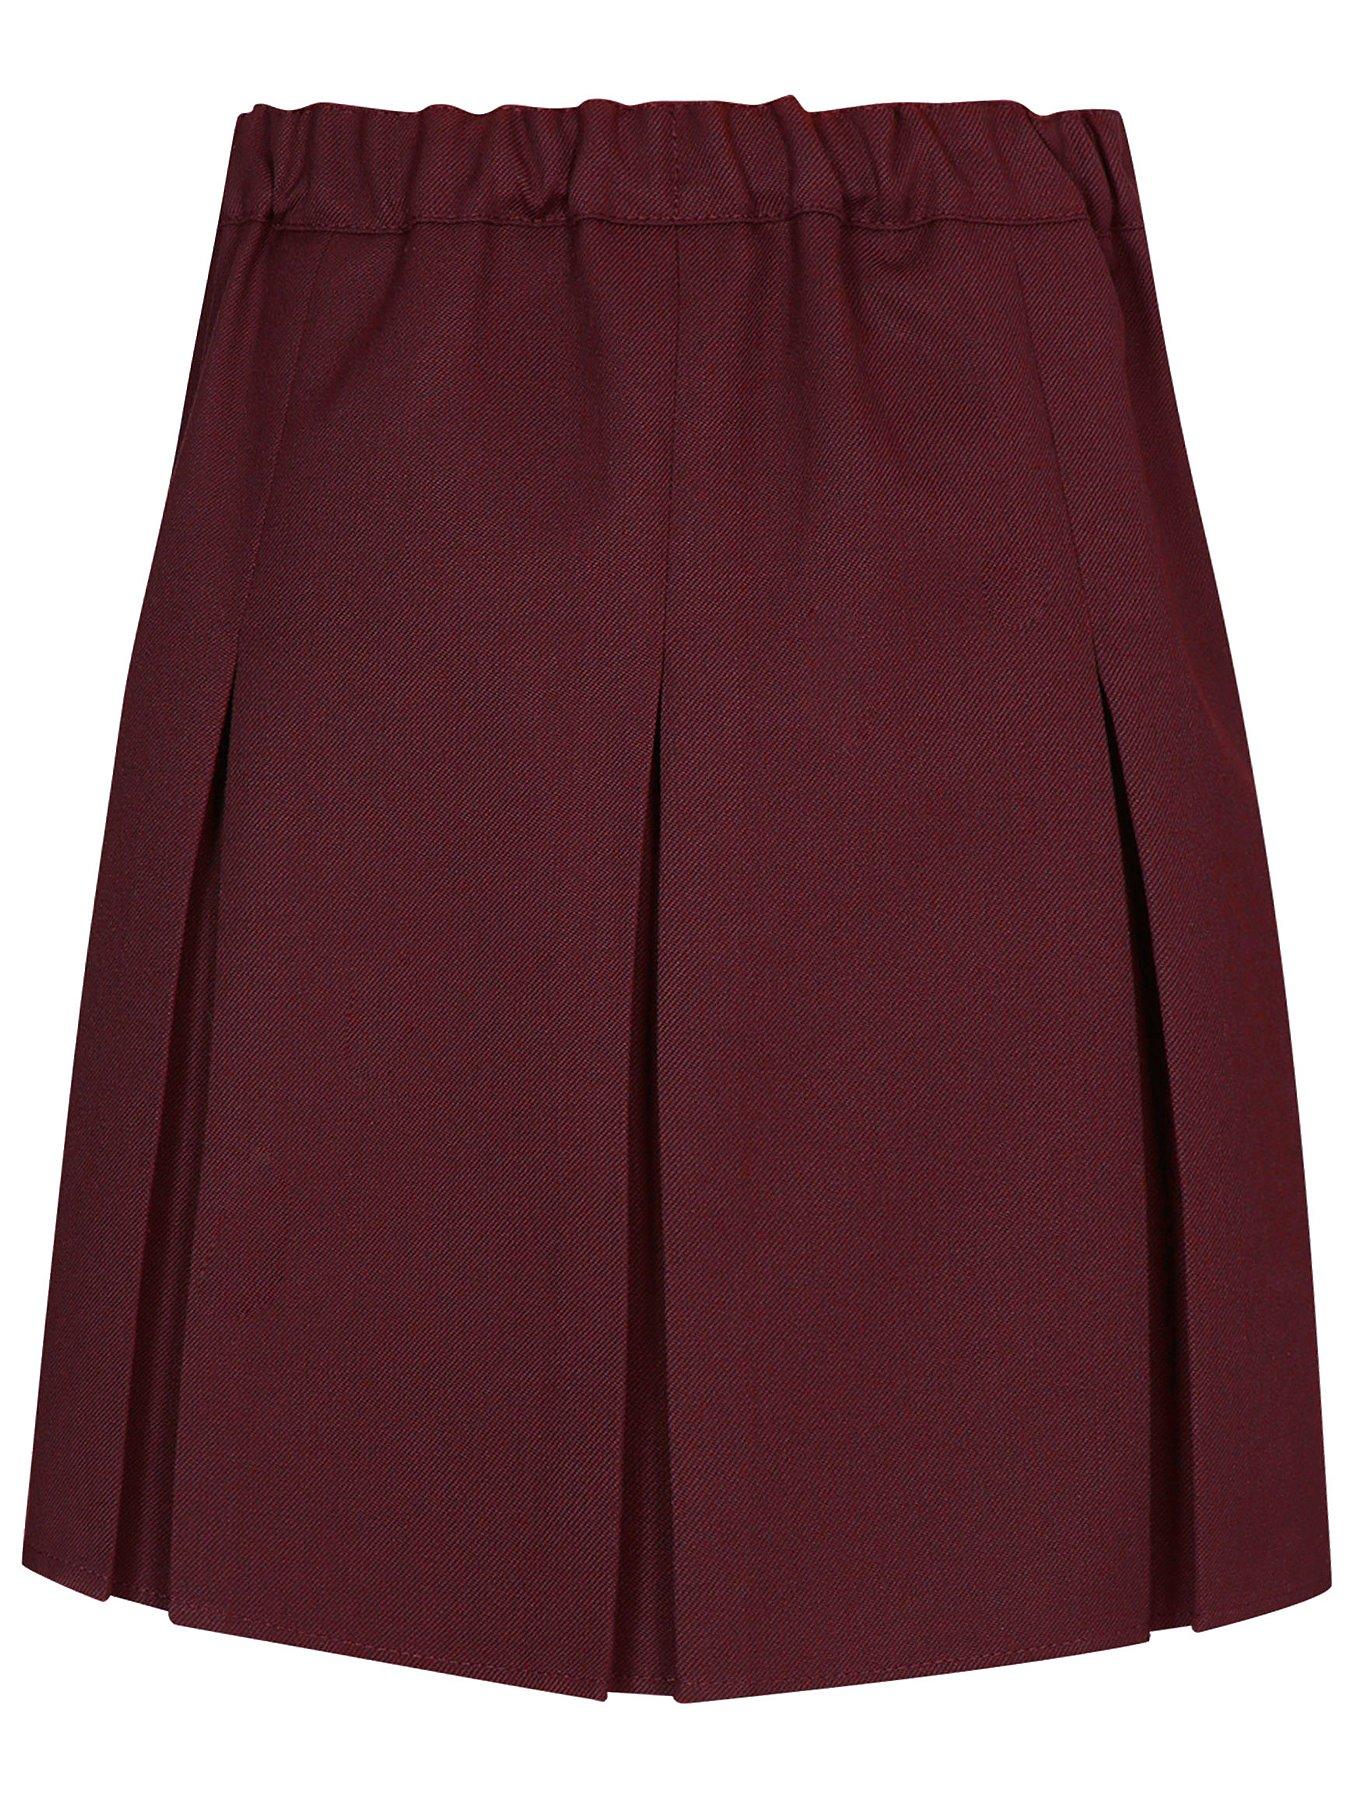 a42f9b0e6 Girls Burgundy Pleated School Skirt | School | George